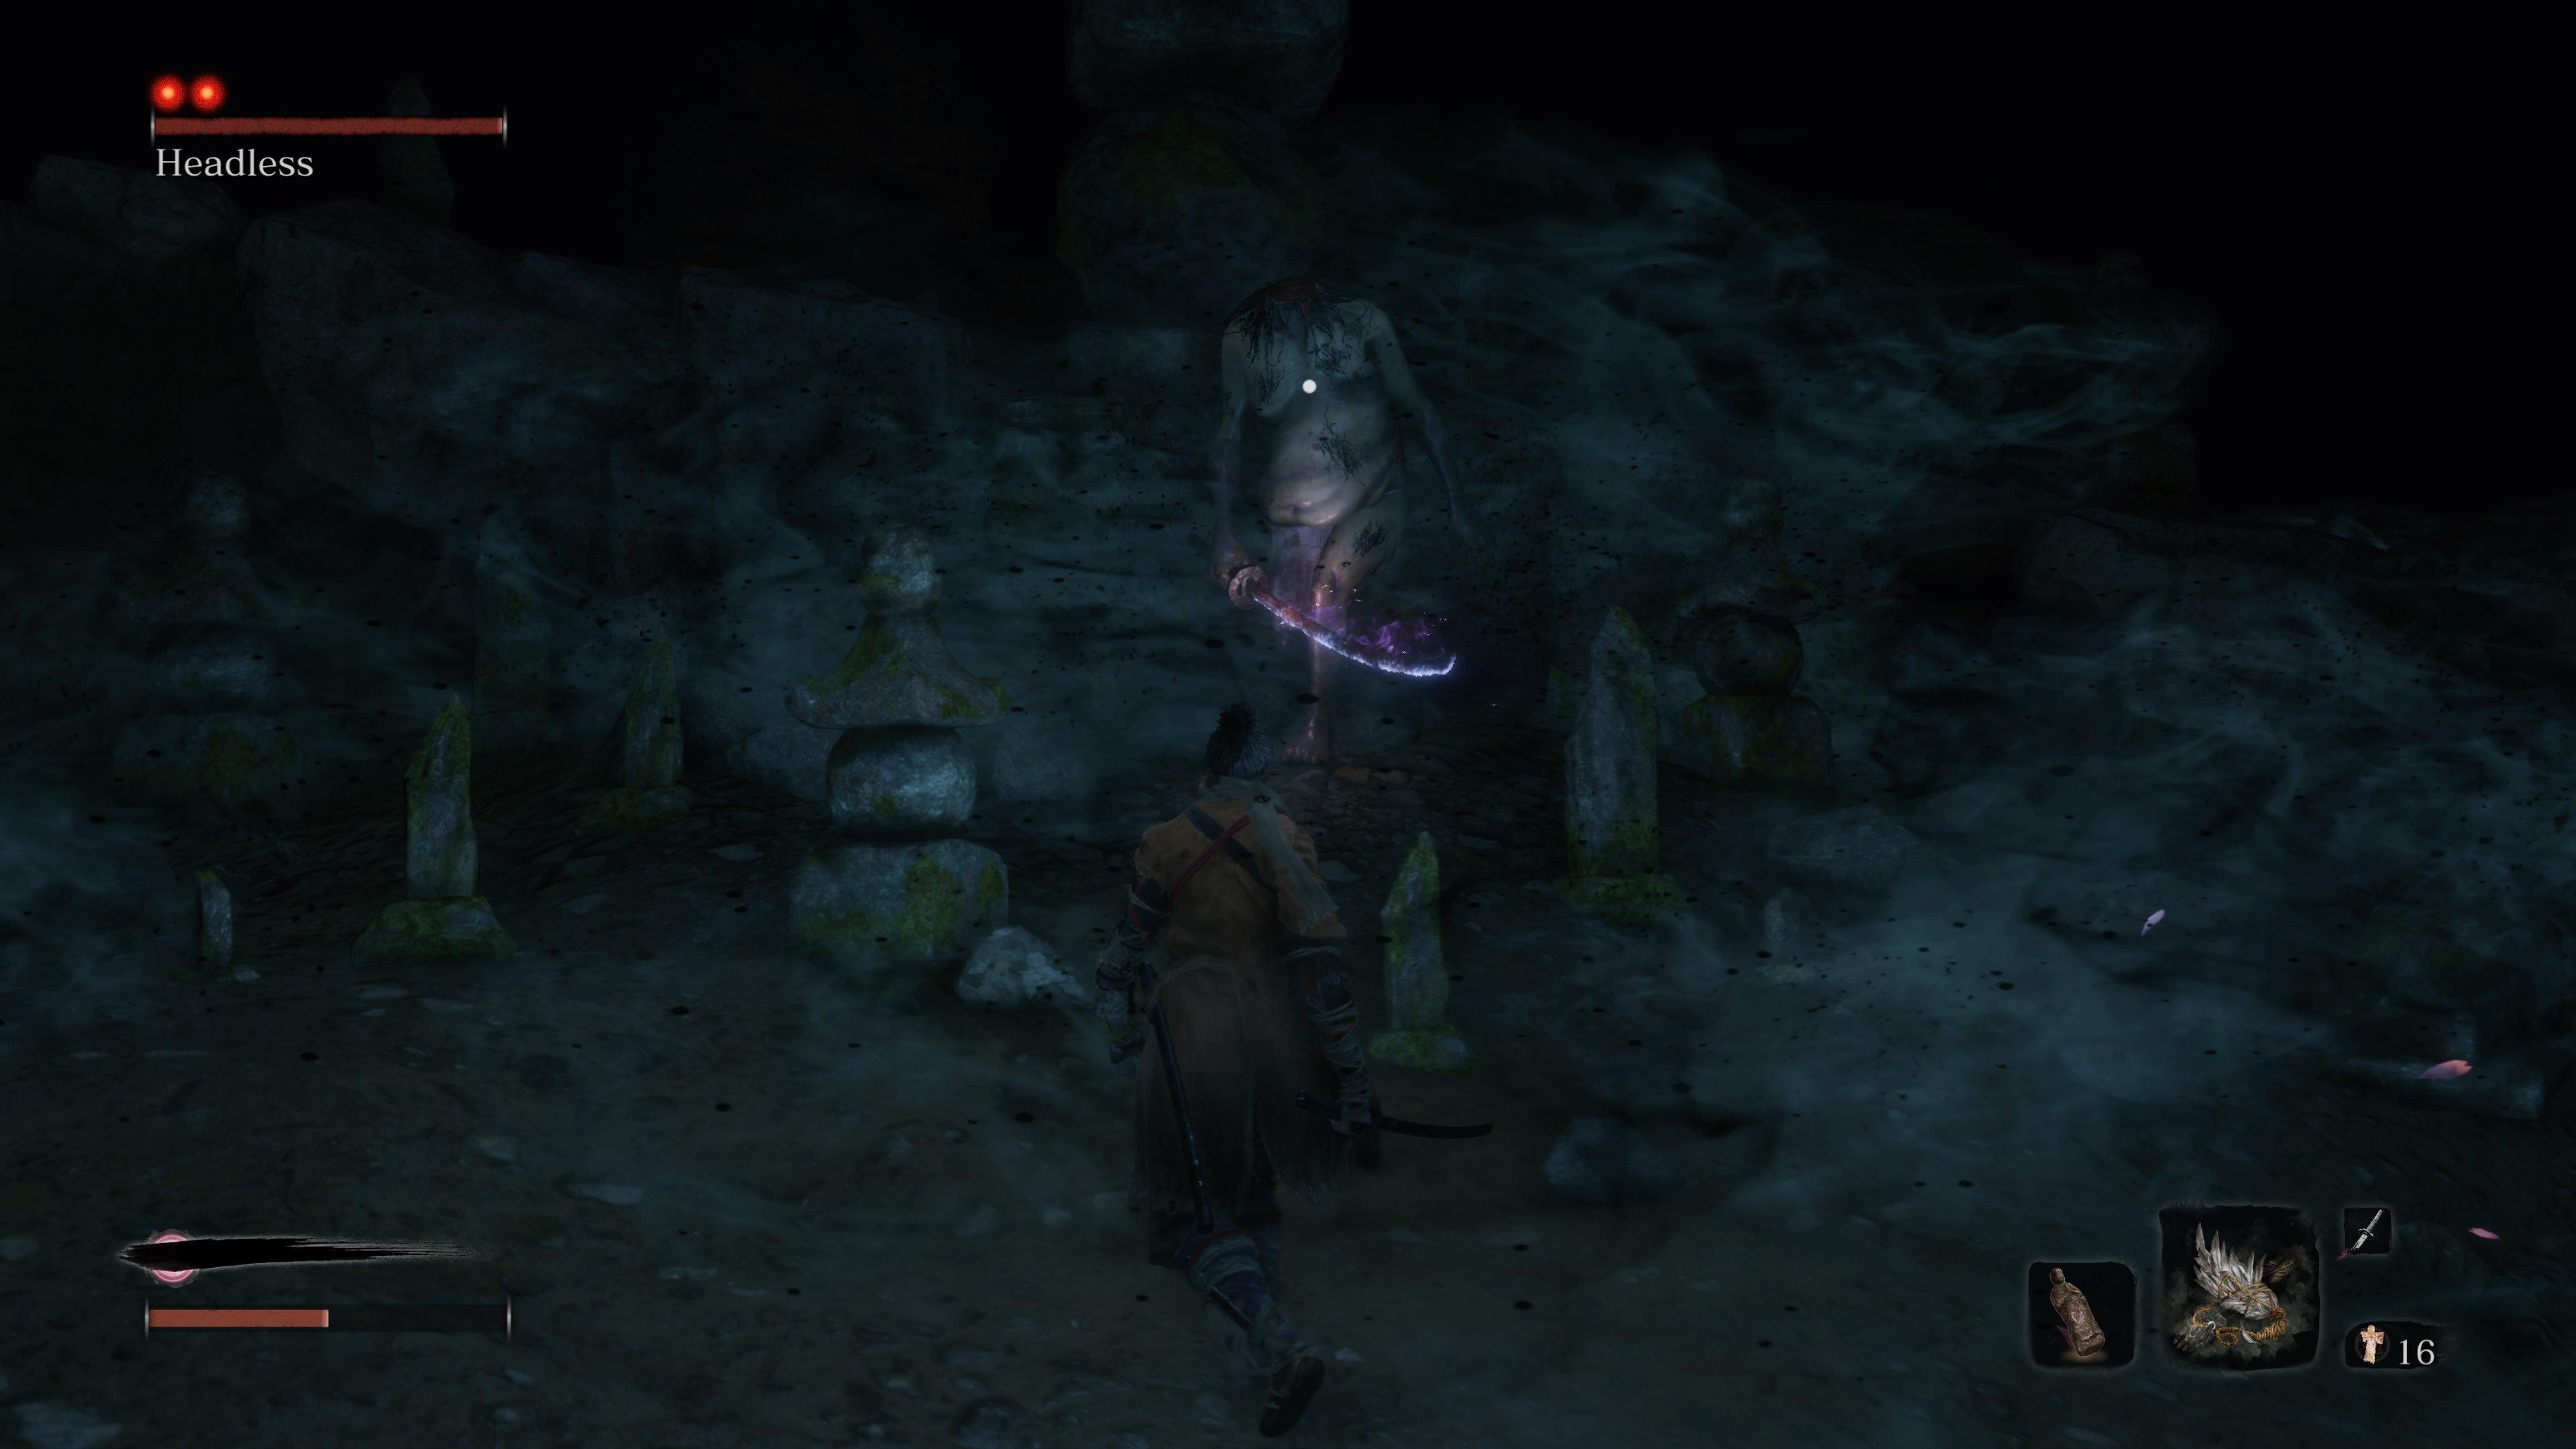 How to beat Headless in Sekiro: Shadows Die Twice